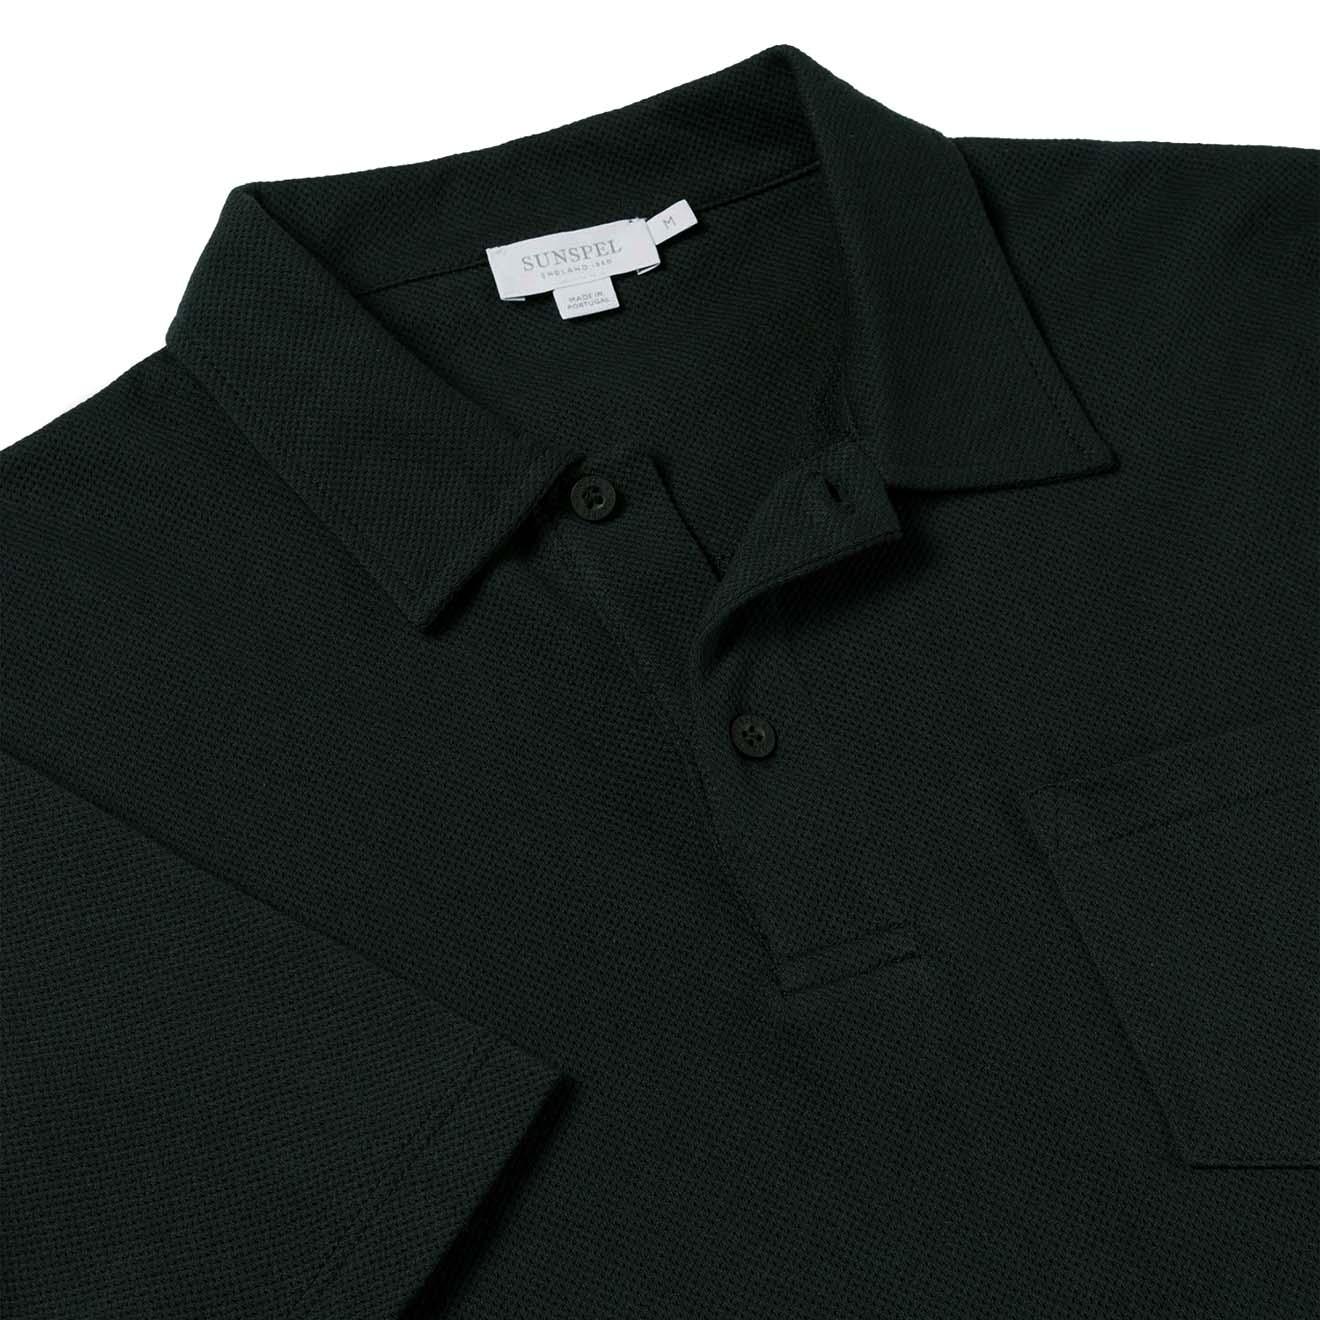 8086ecc1 Sunspel Short Sleeve Riviera Polo Botiglia Green - The Sporting Lodge